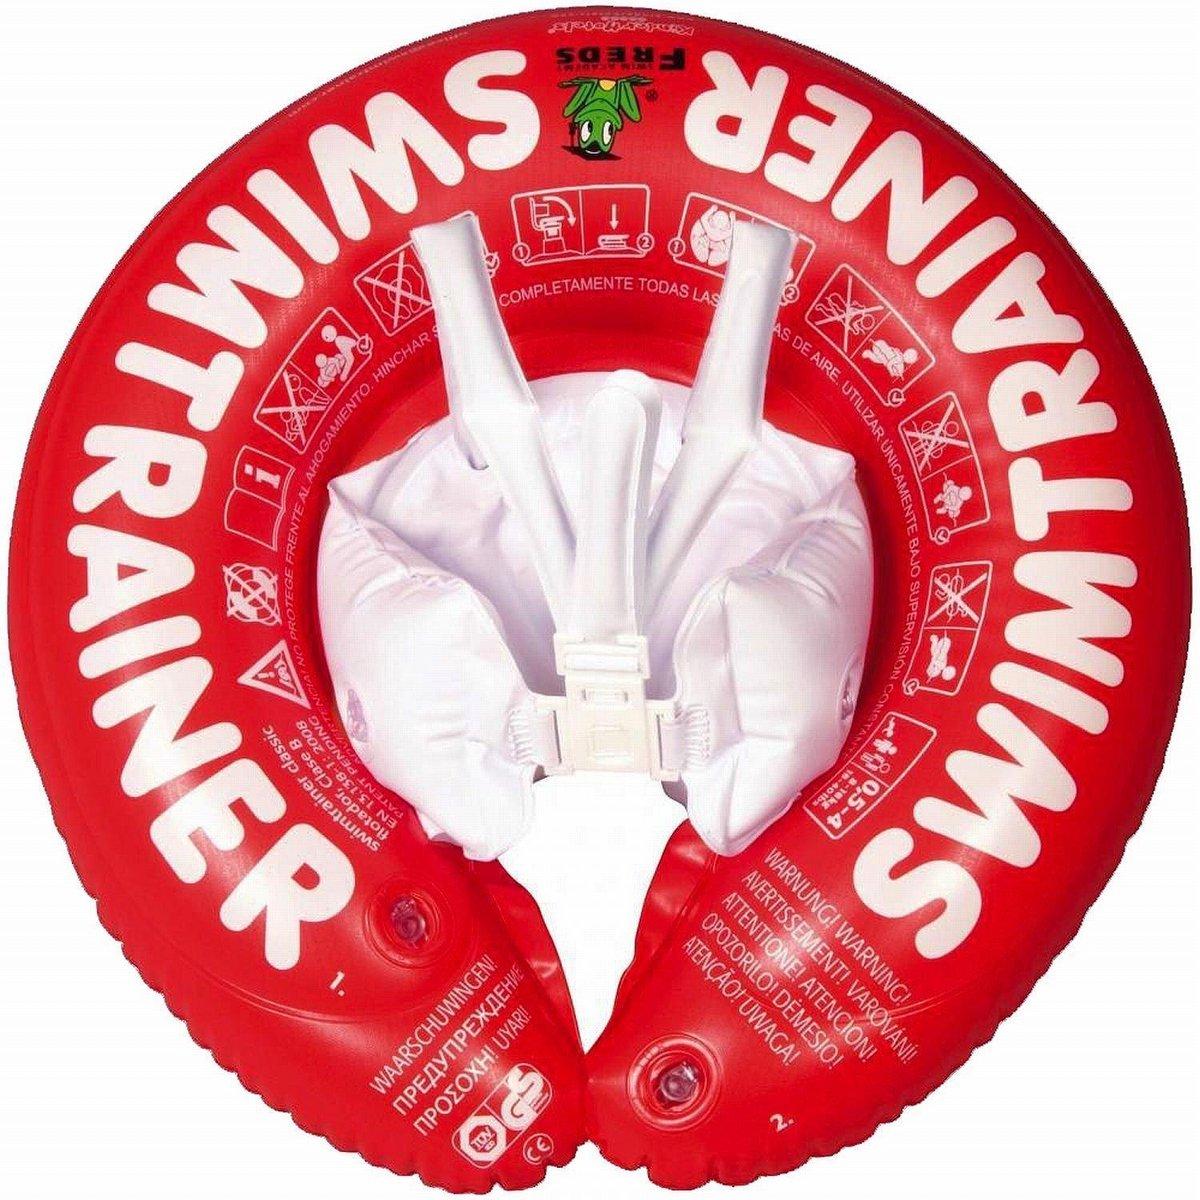 Freds Zwemtrainer - Rood - 6 tot 18 kg